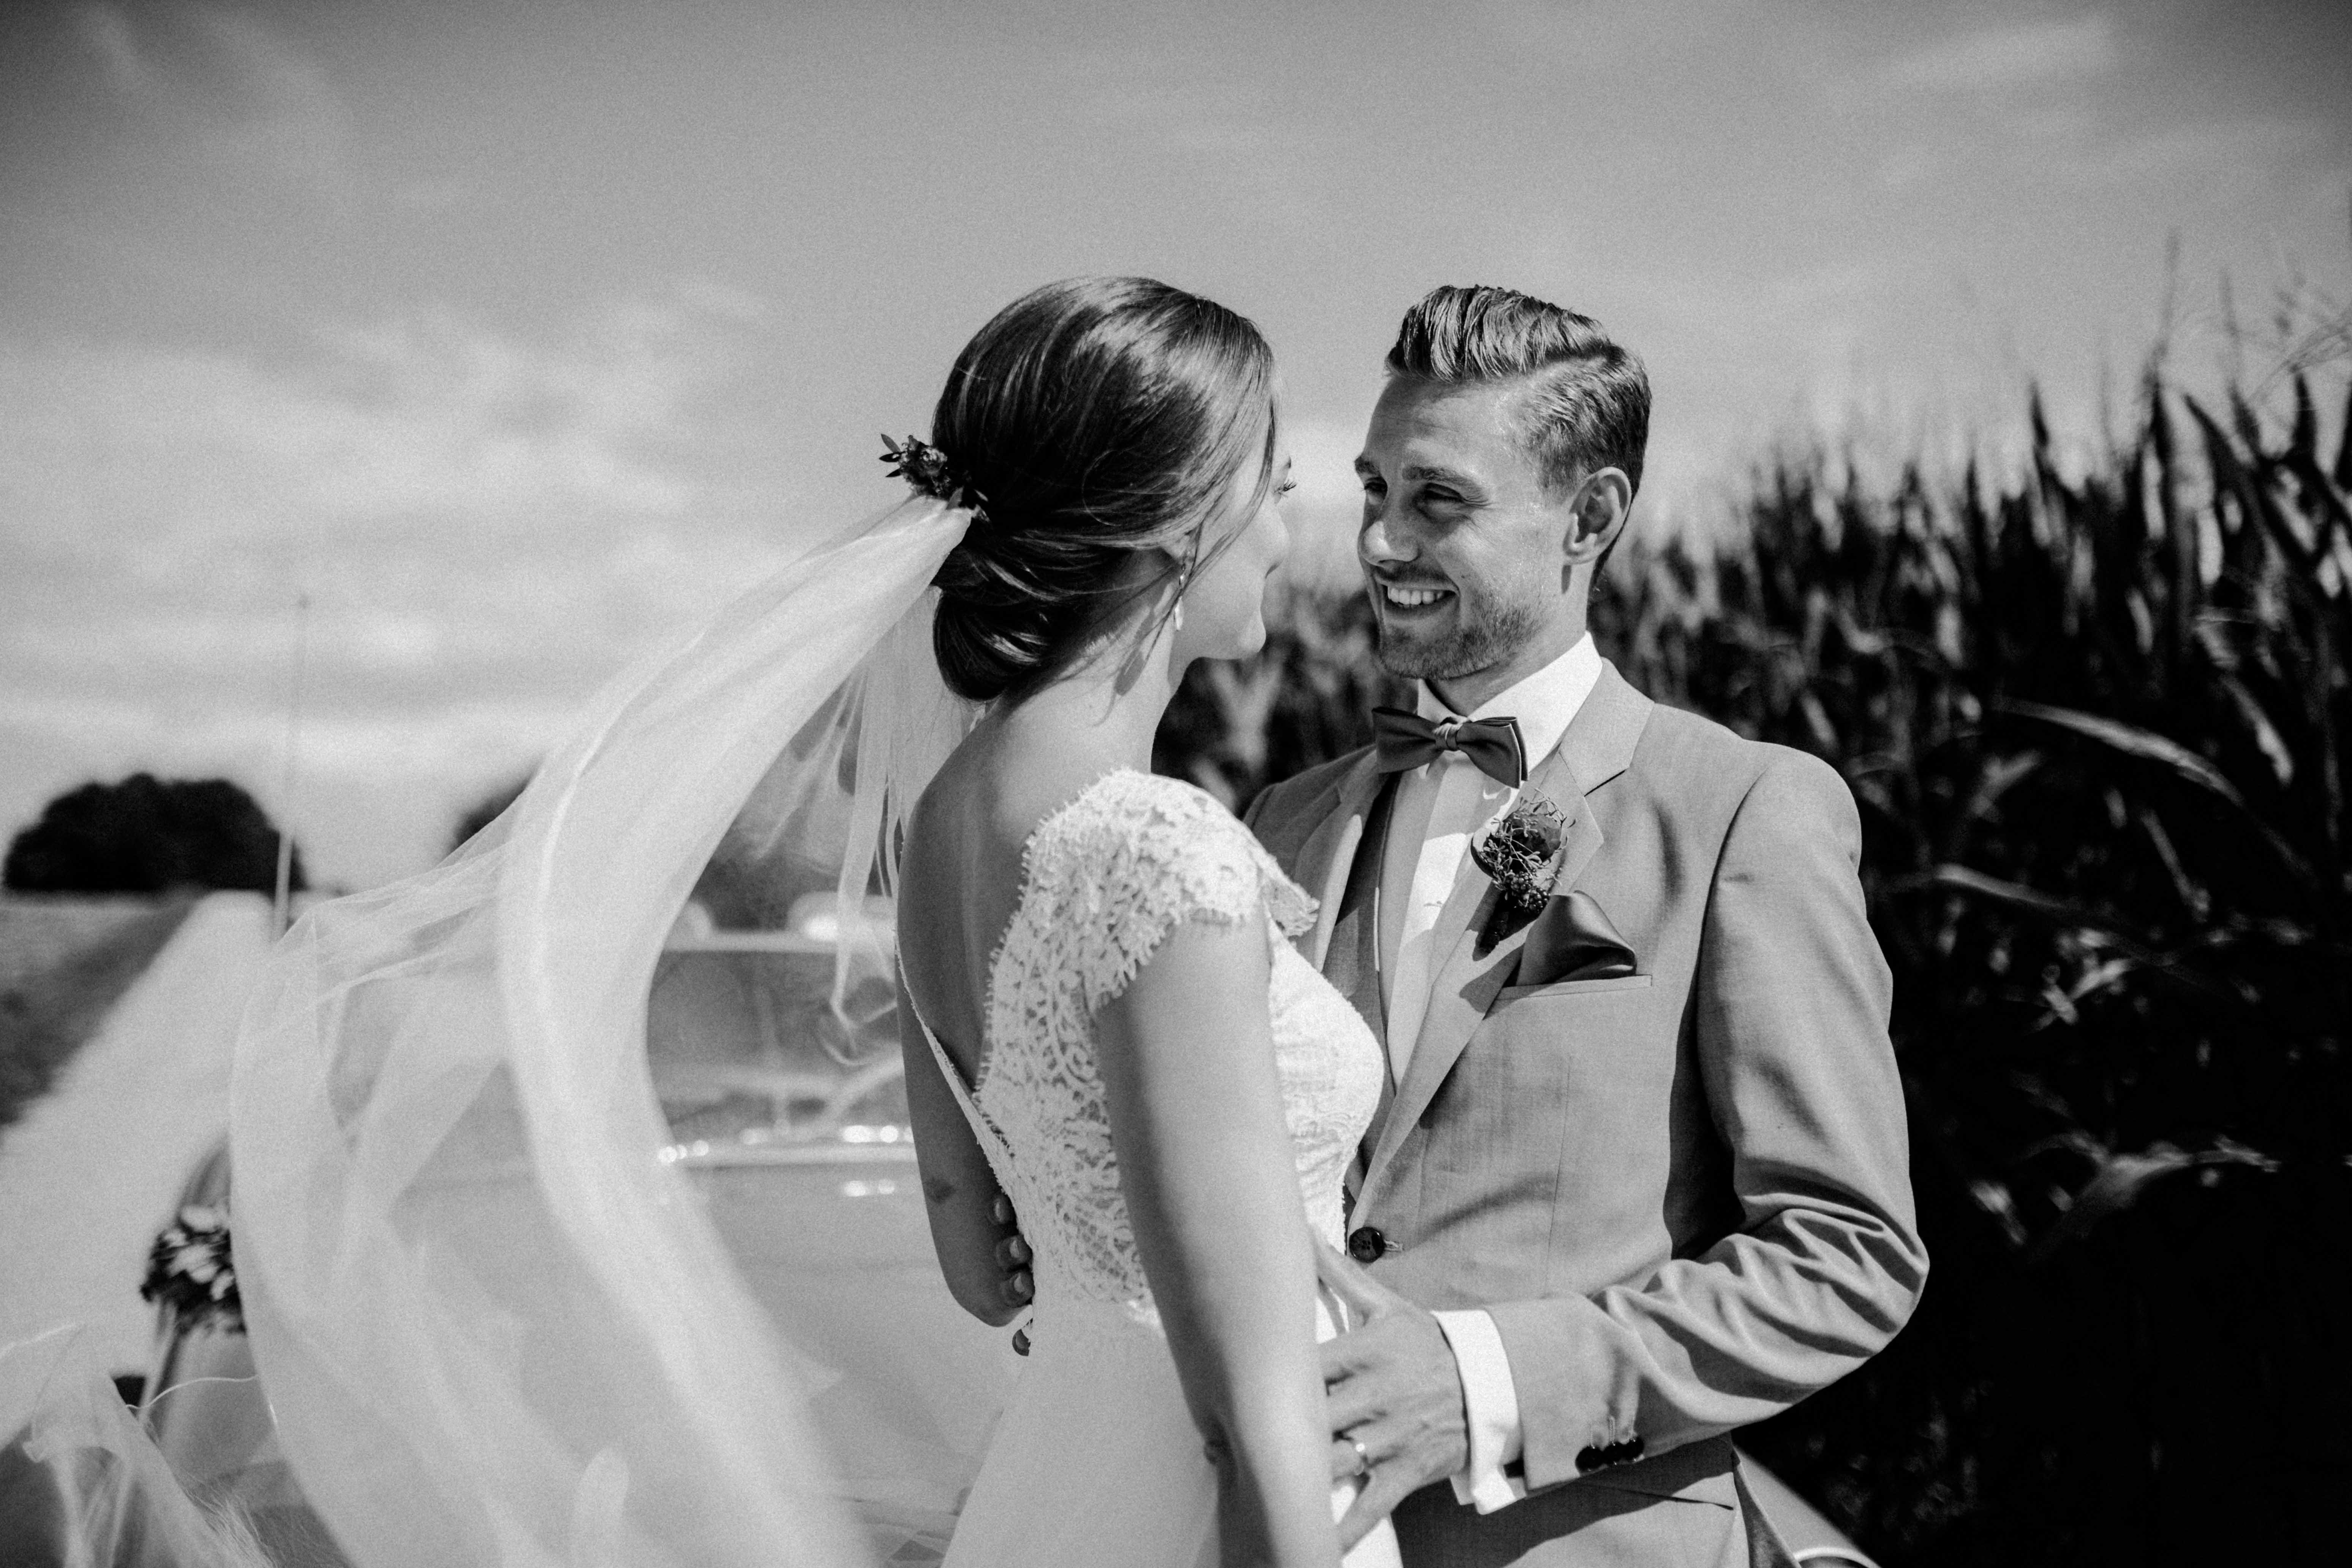 couplegoal smile sonja poehlmann photography couples muenchen bayern